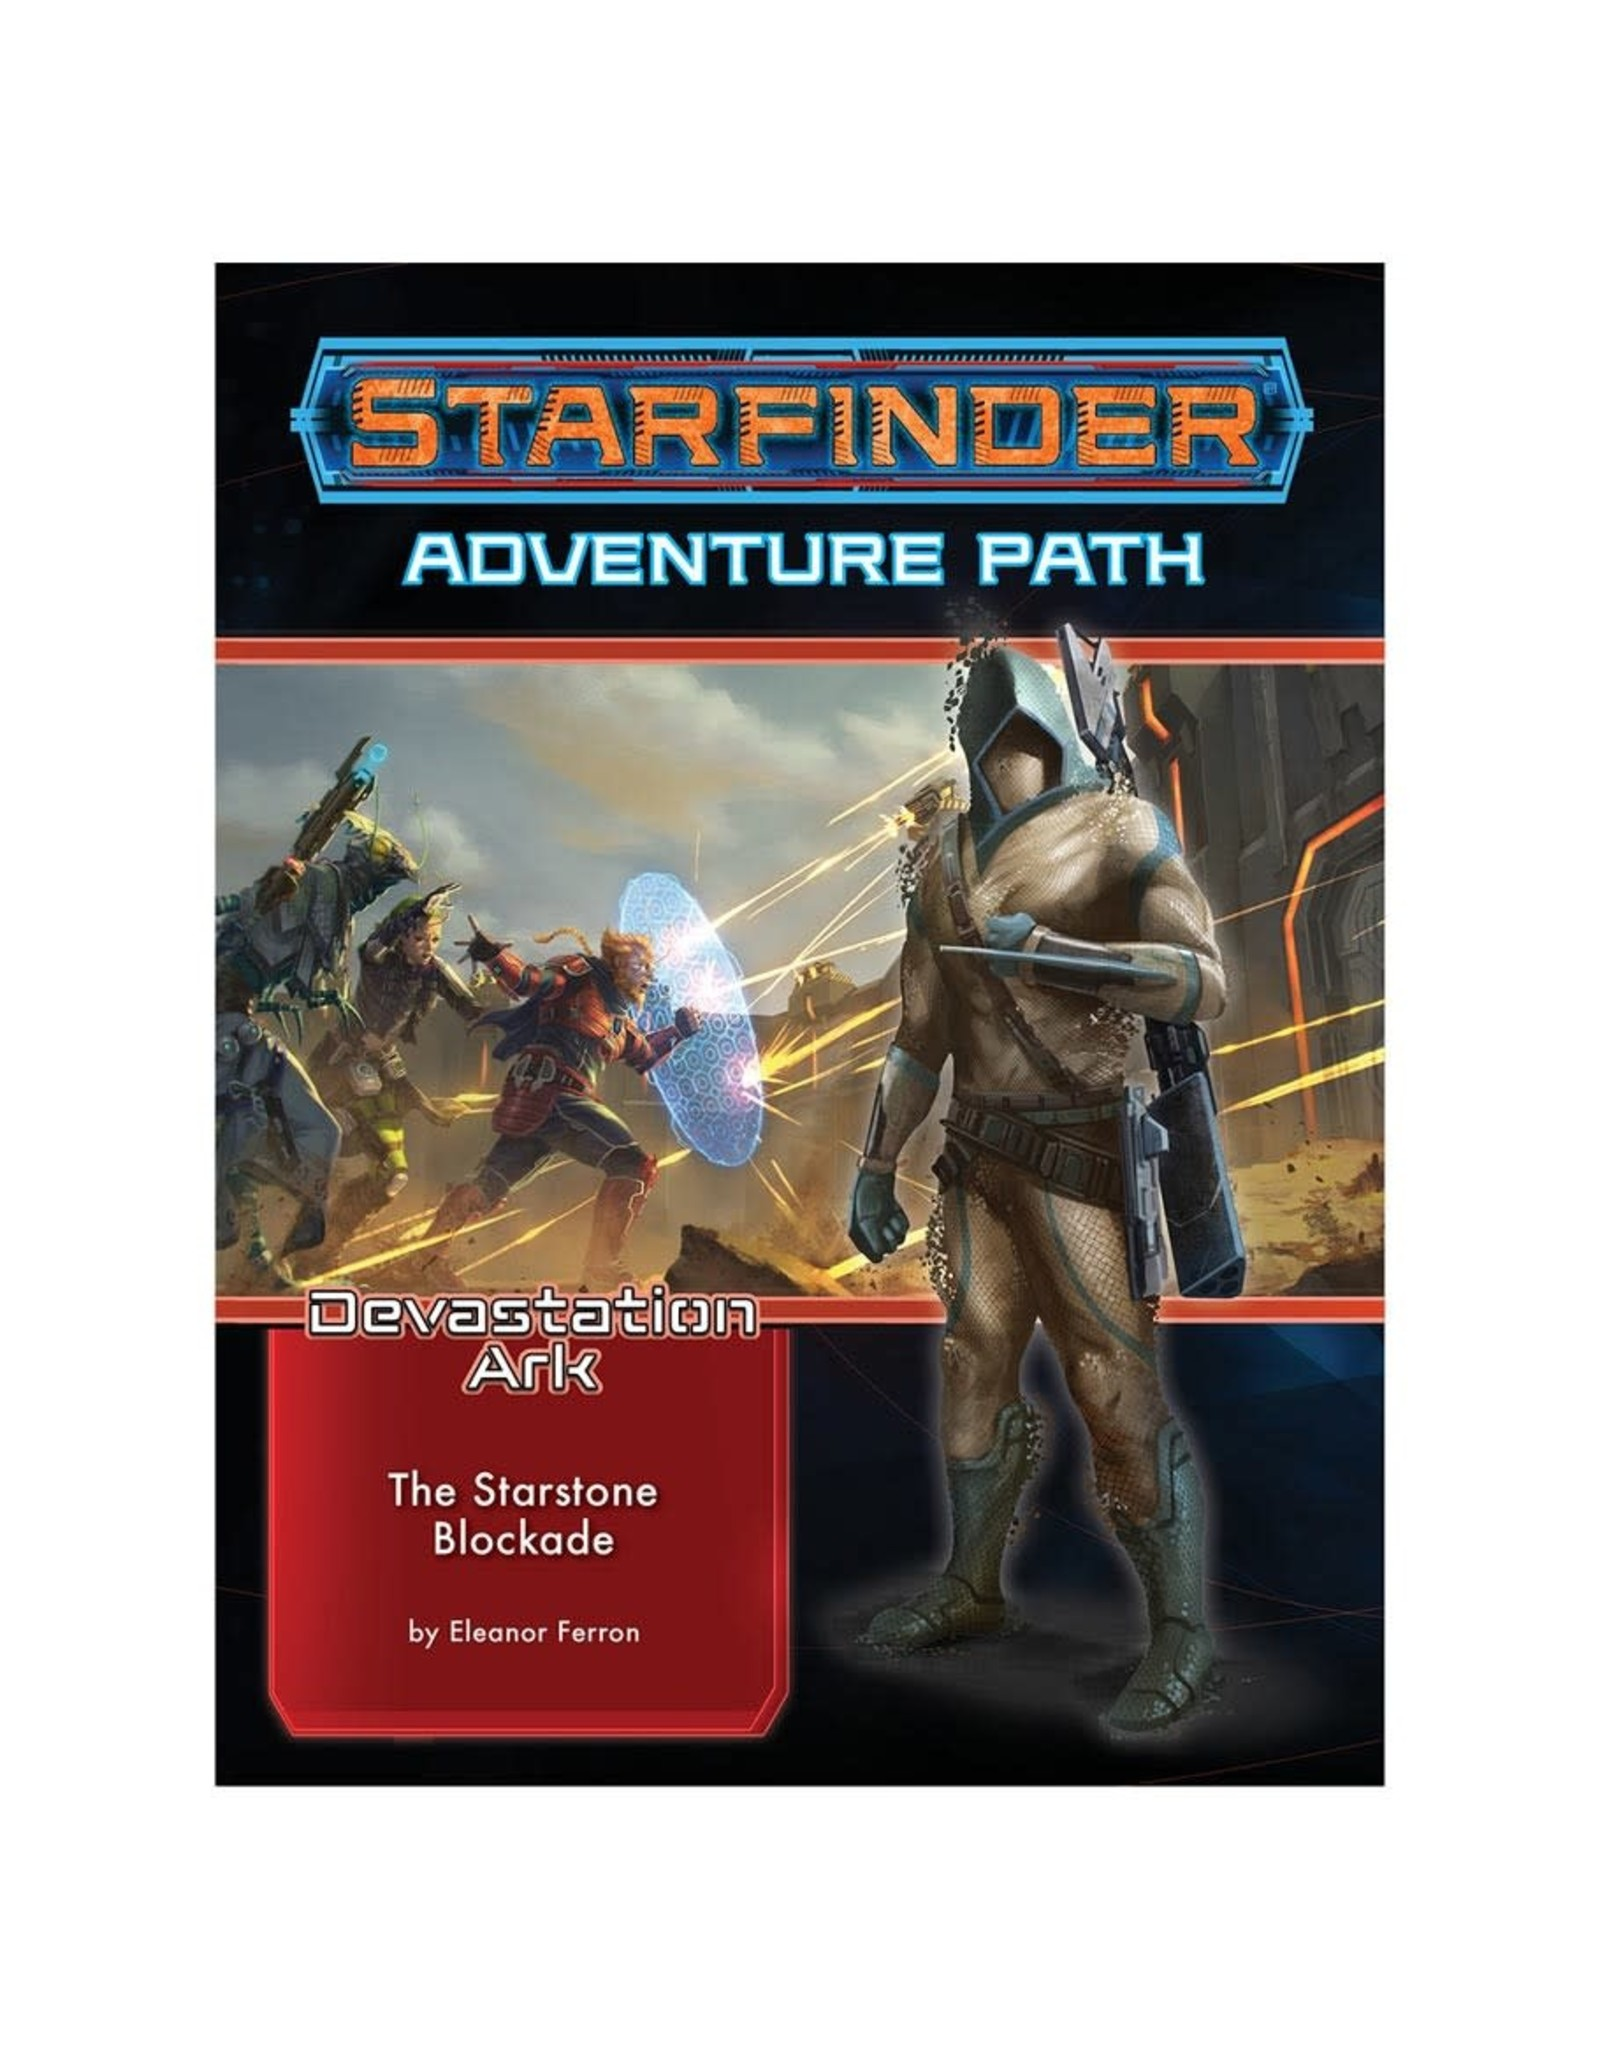 Paizo Starfinder Adventure Path: Devastation Ark 2 - The Starstone Blockade